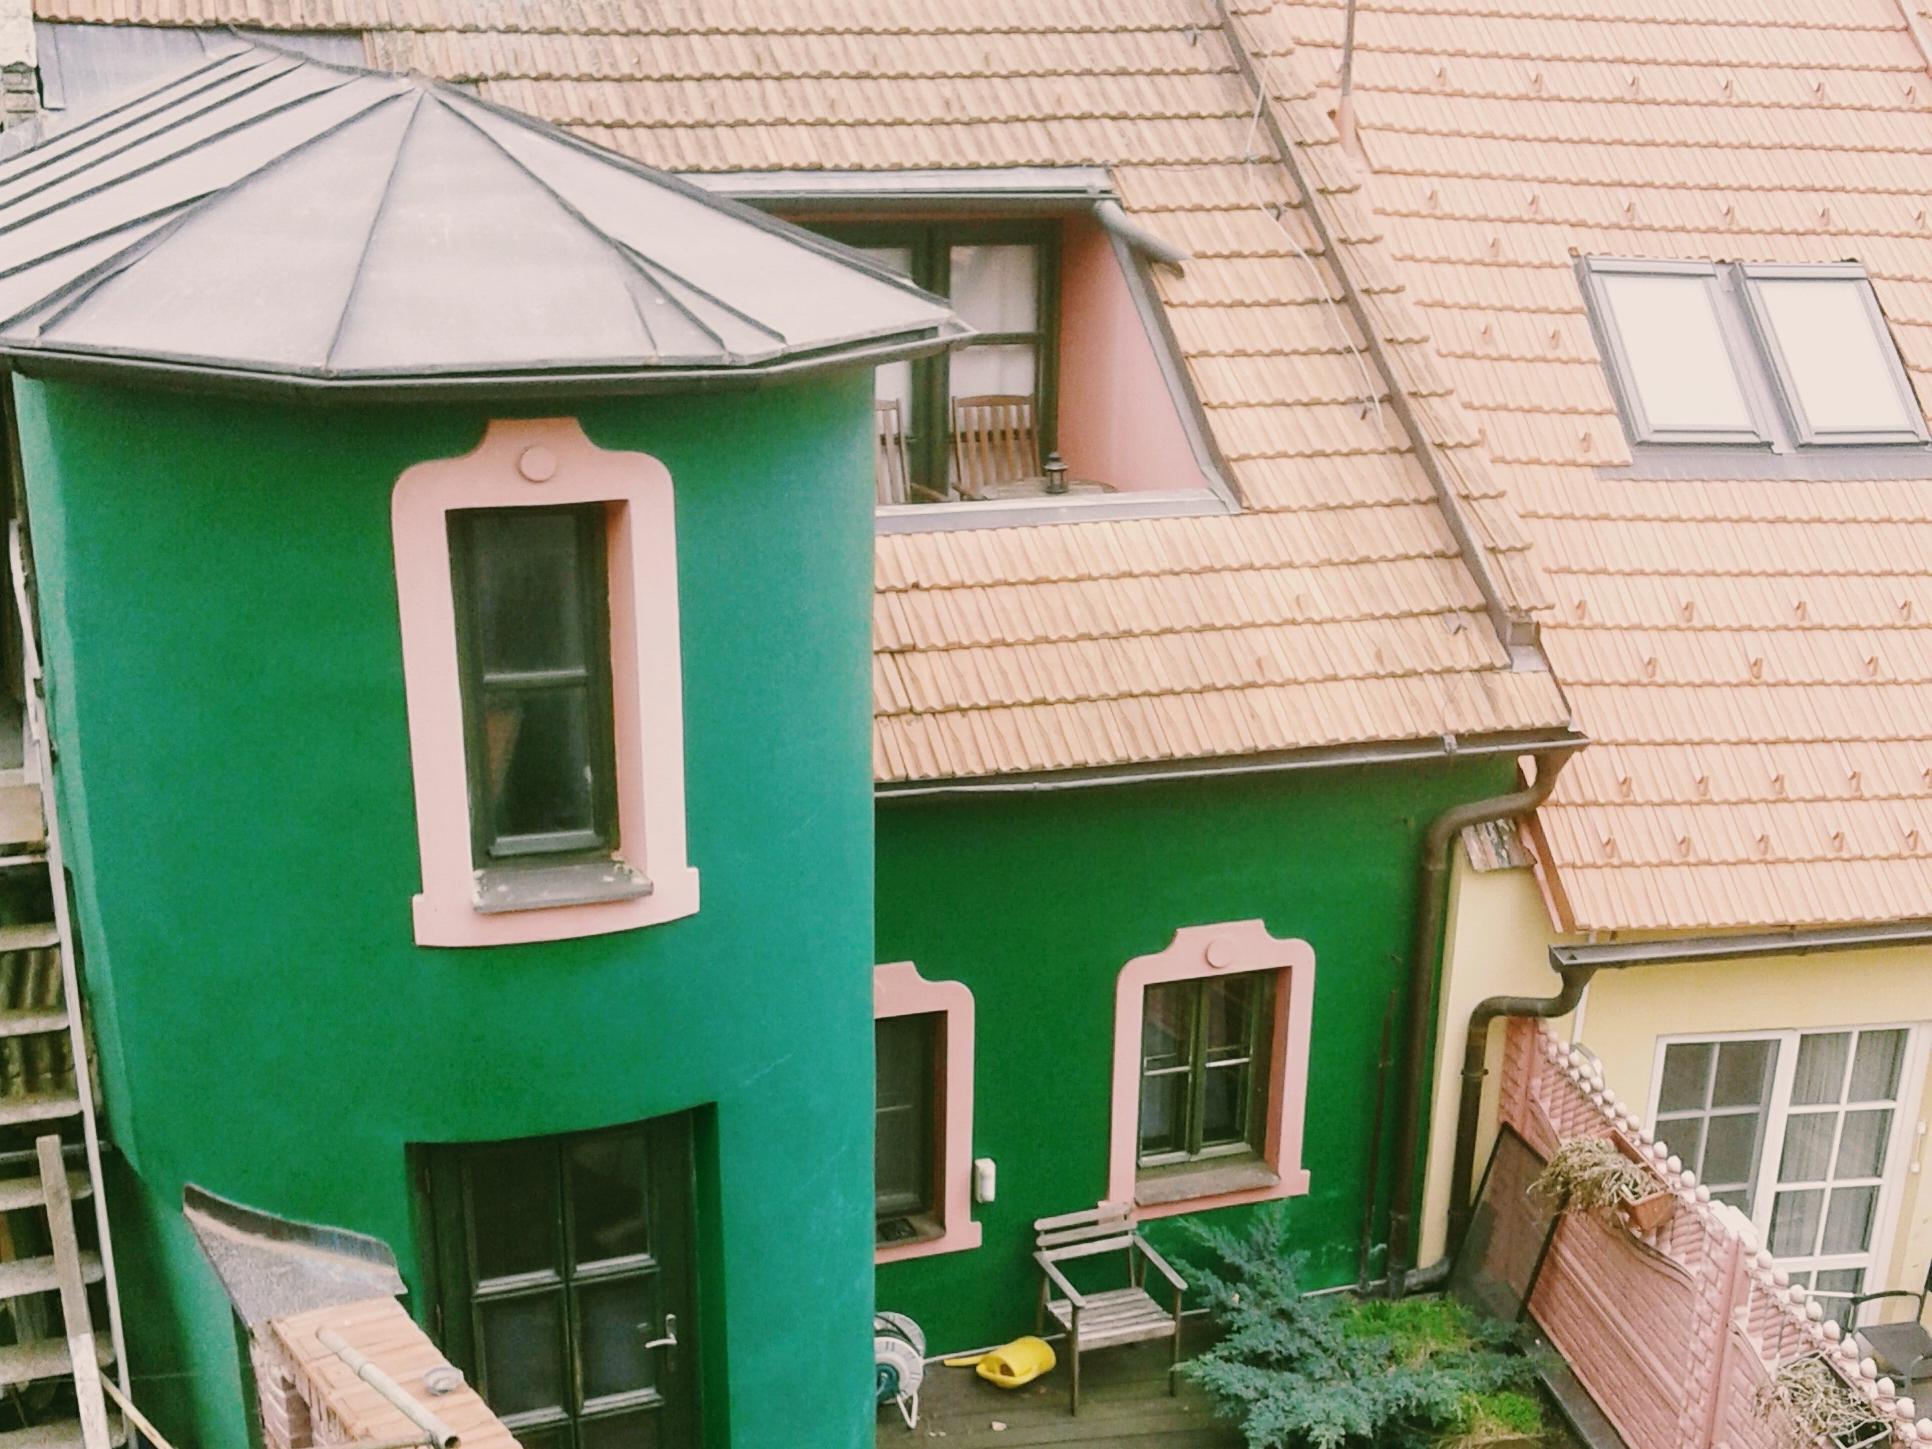 https://i.amy.gy/201804-slovakia-austria-czech/IMG_20180416_153155.jpg